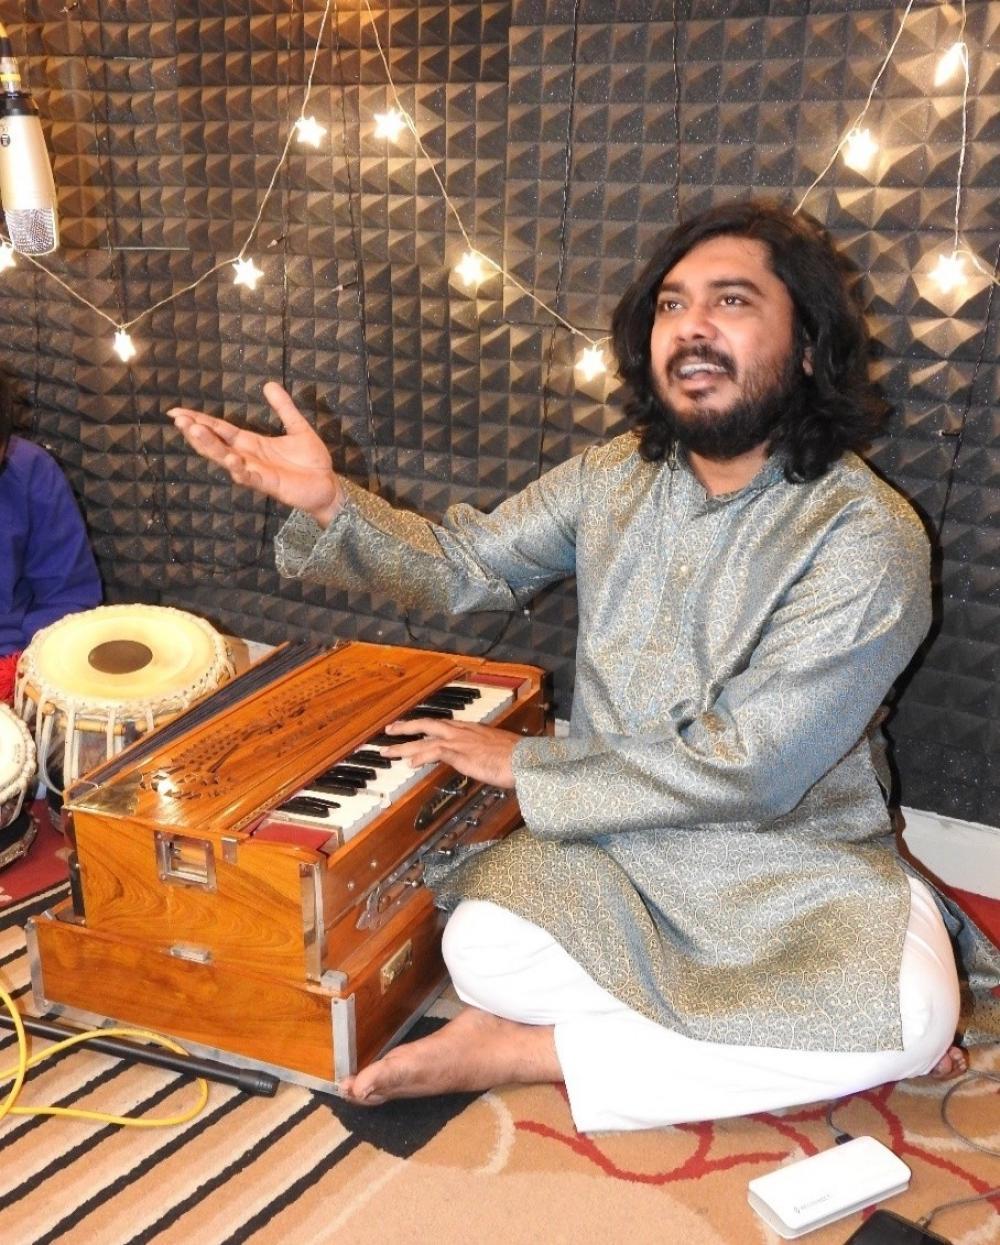 The Weekend Leader - Fusion dissolves all barriers: Classical singer Nadeem Khan